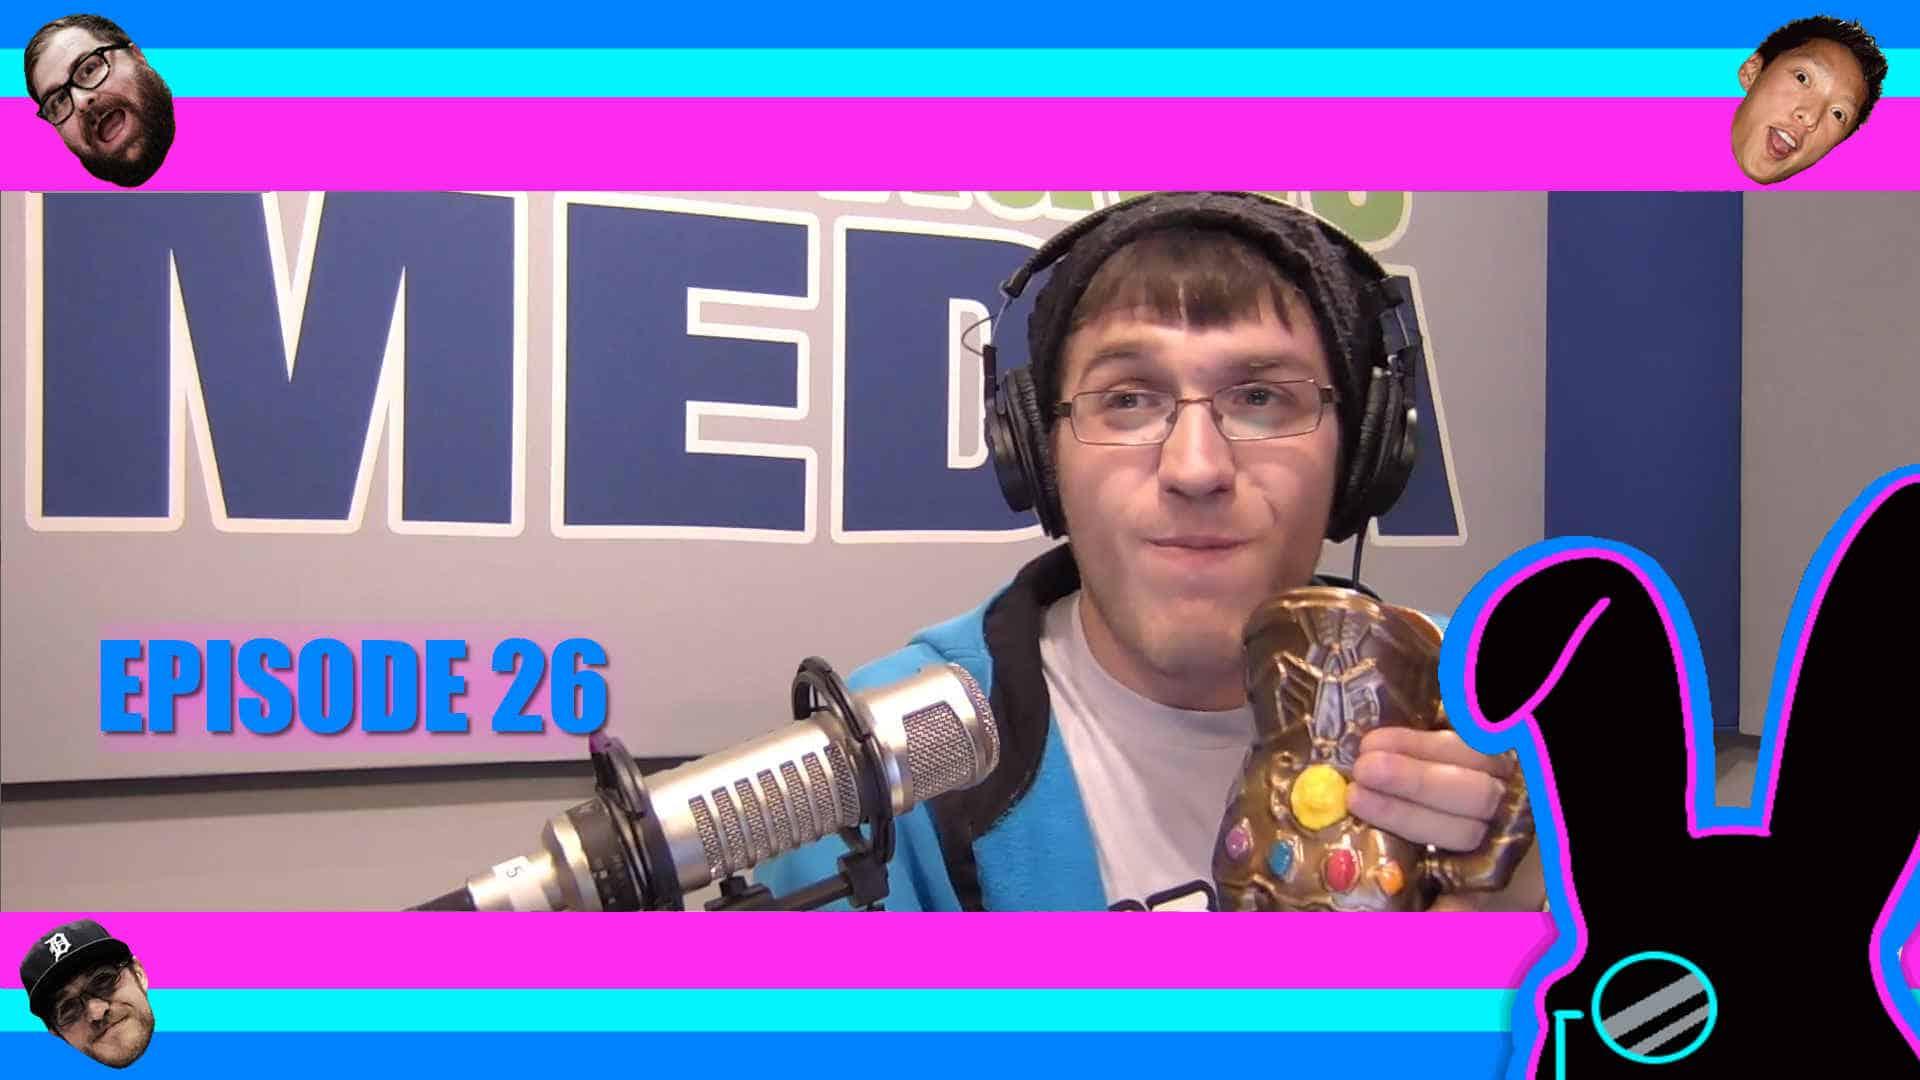 Geektainment Weekly Episode 26